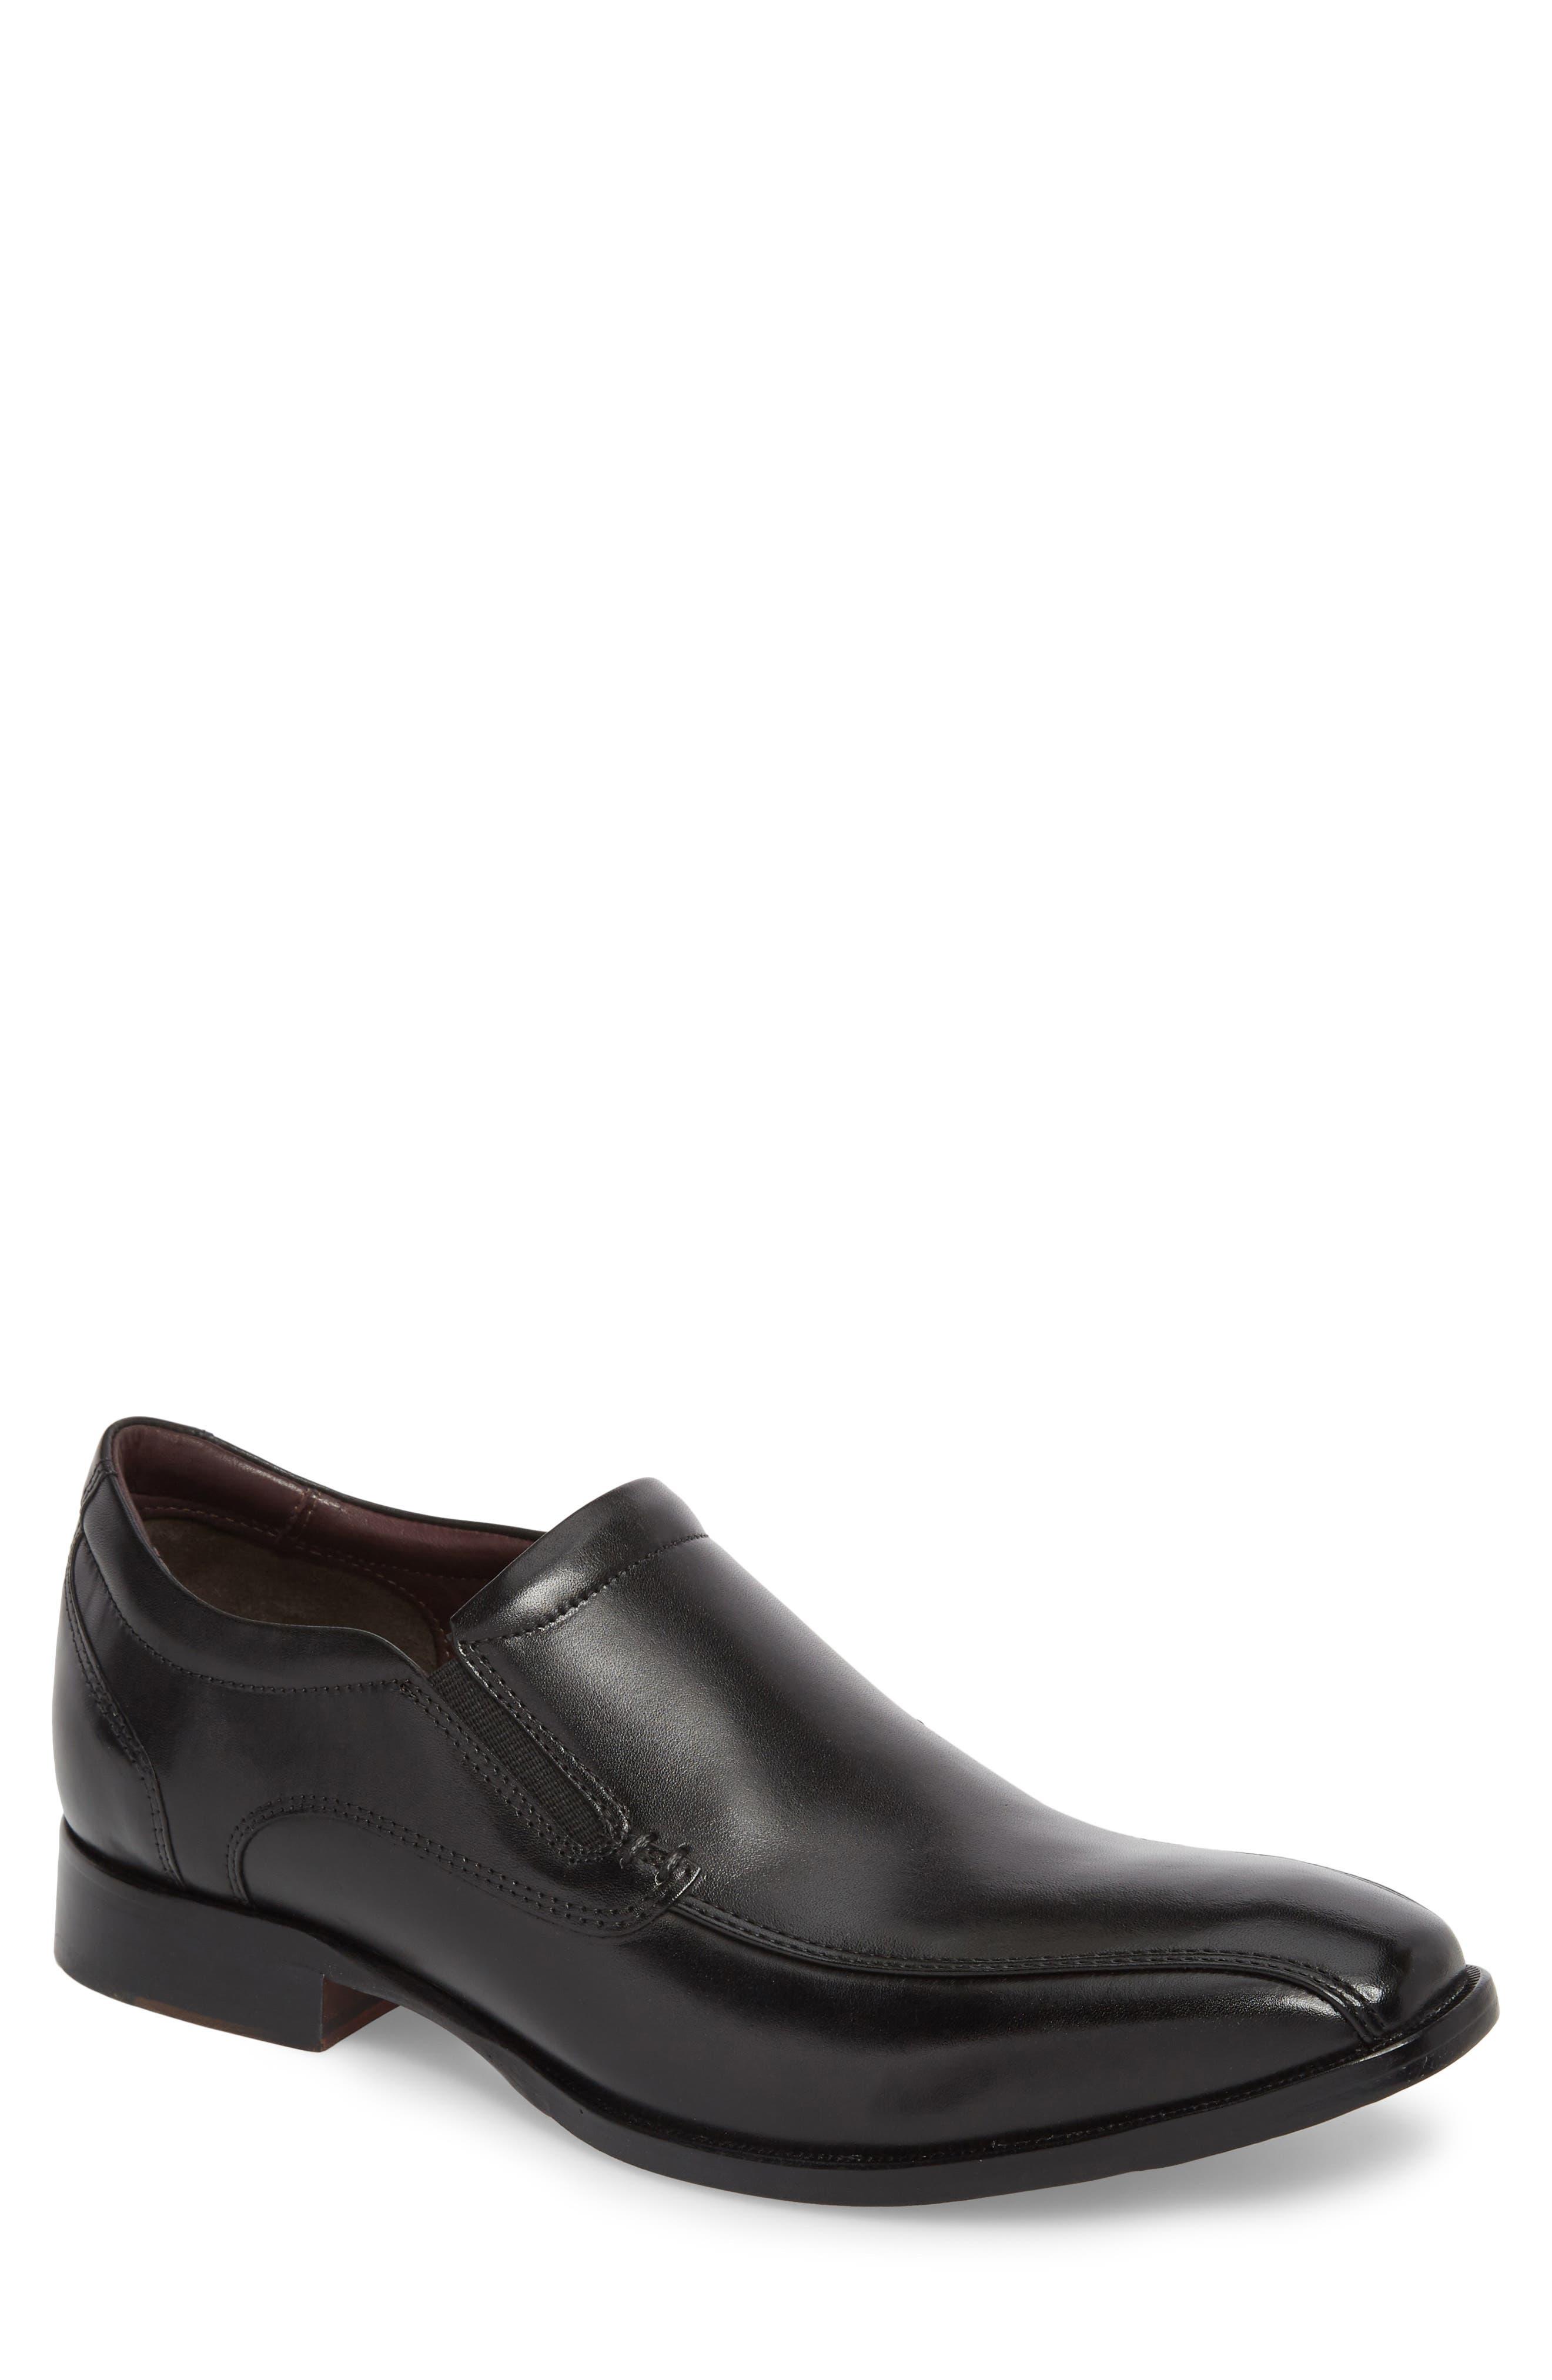 McClain Runoff Bike Toe Slip-On,                         Main,                         color, Black Leather